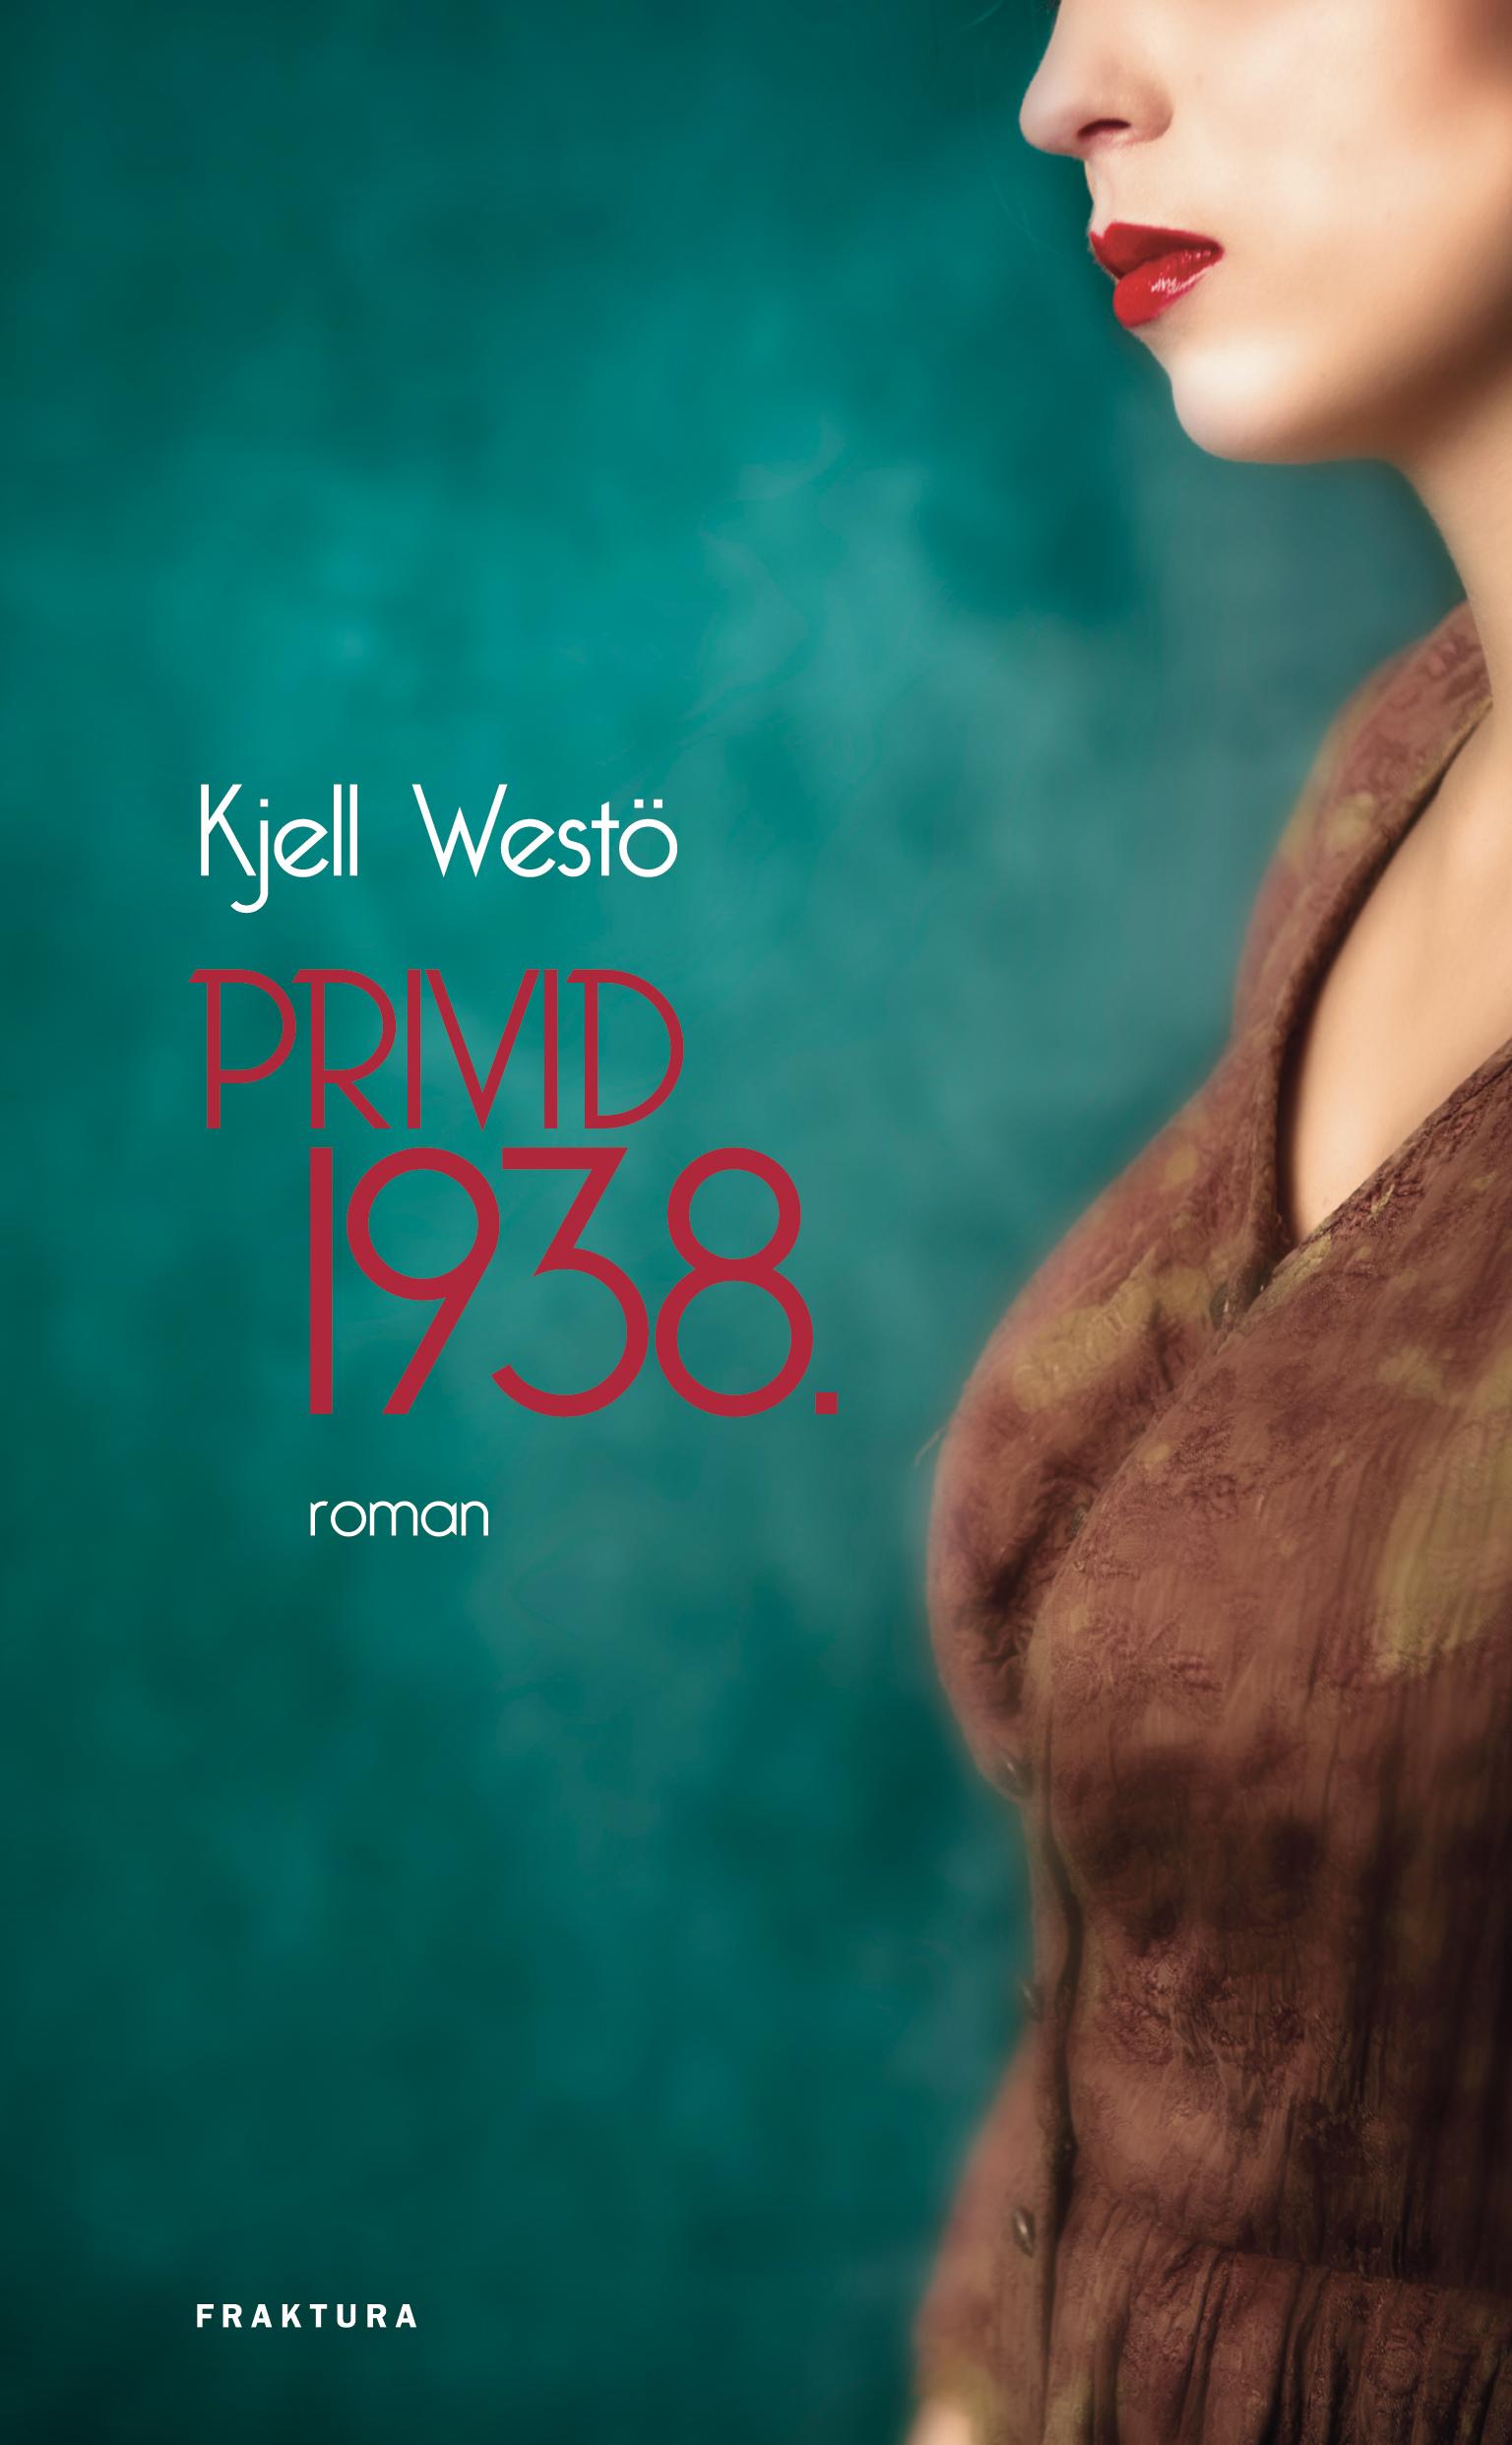 Privid 1938.